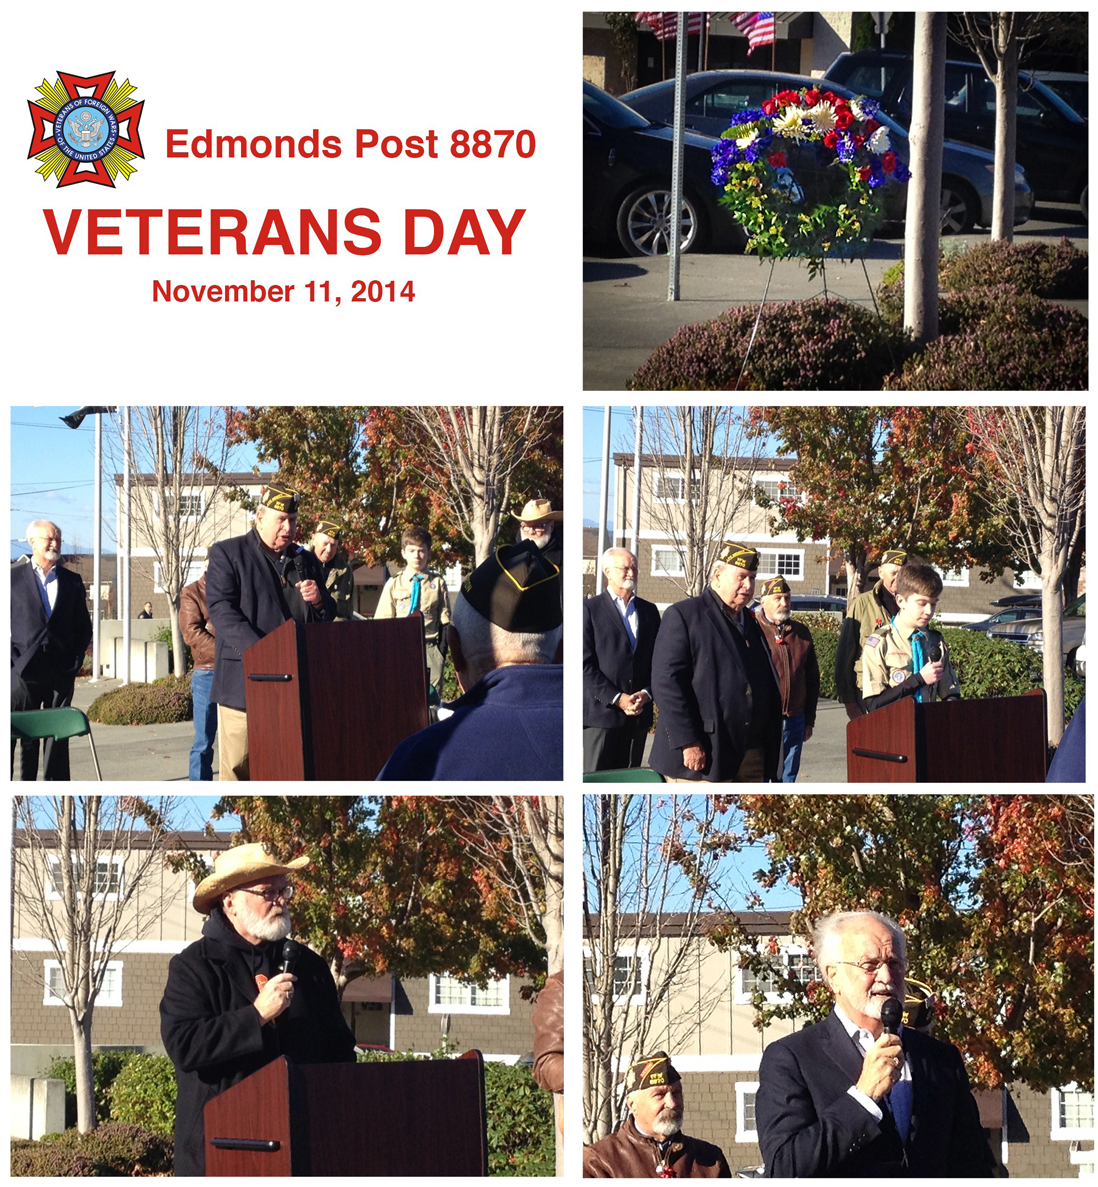 Veterans Day Ceremony at Edmonds Veterans Plaza